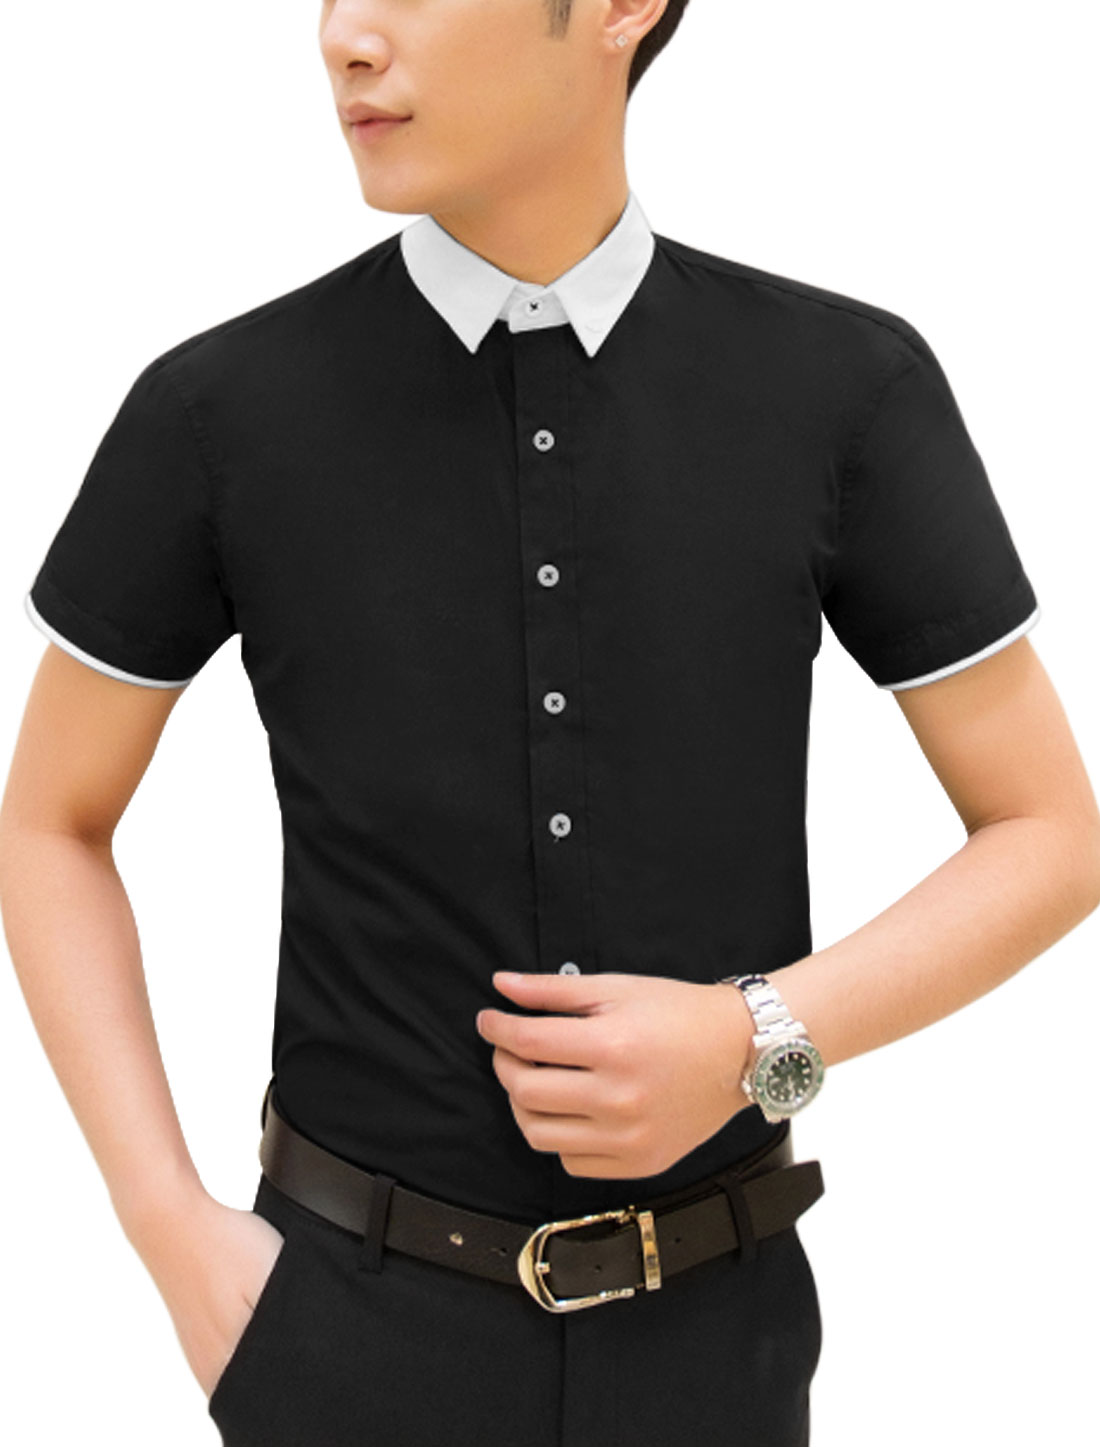 Men Short Sleeve Point Collar Button Down Casual Shirt Black M